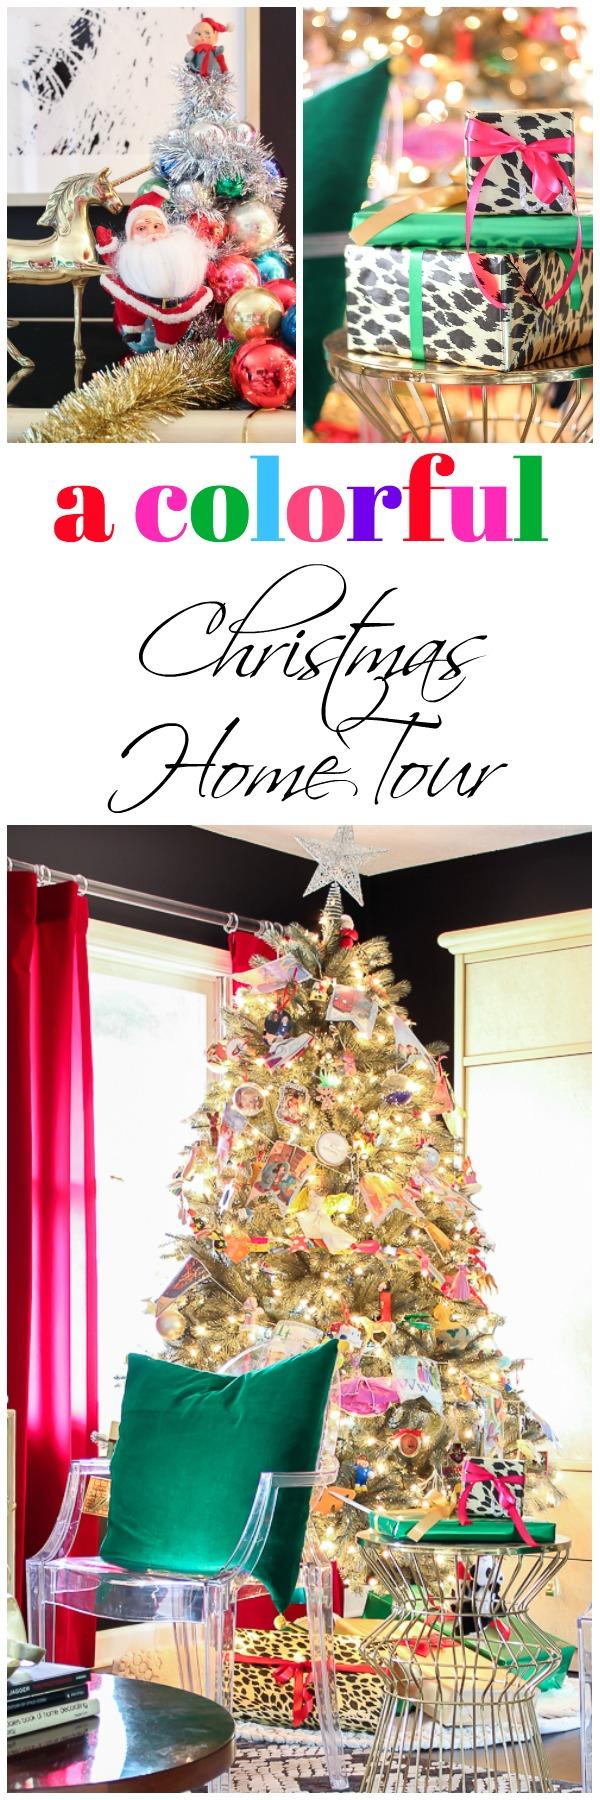 A colorful Christmas home tour